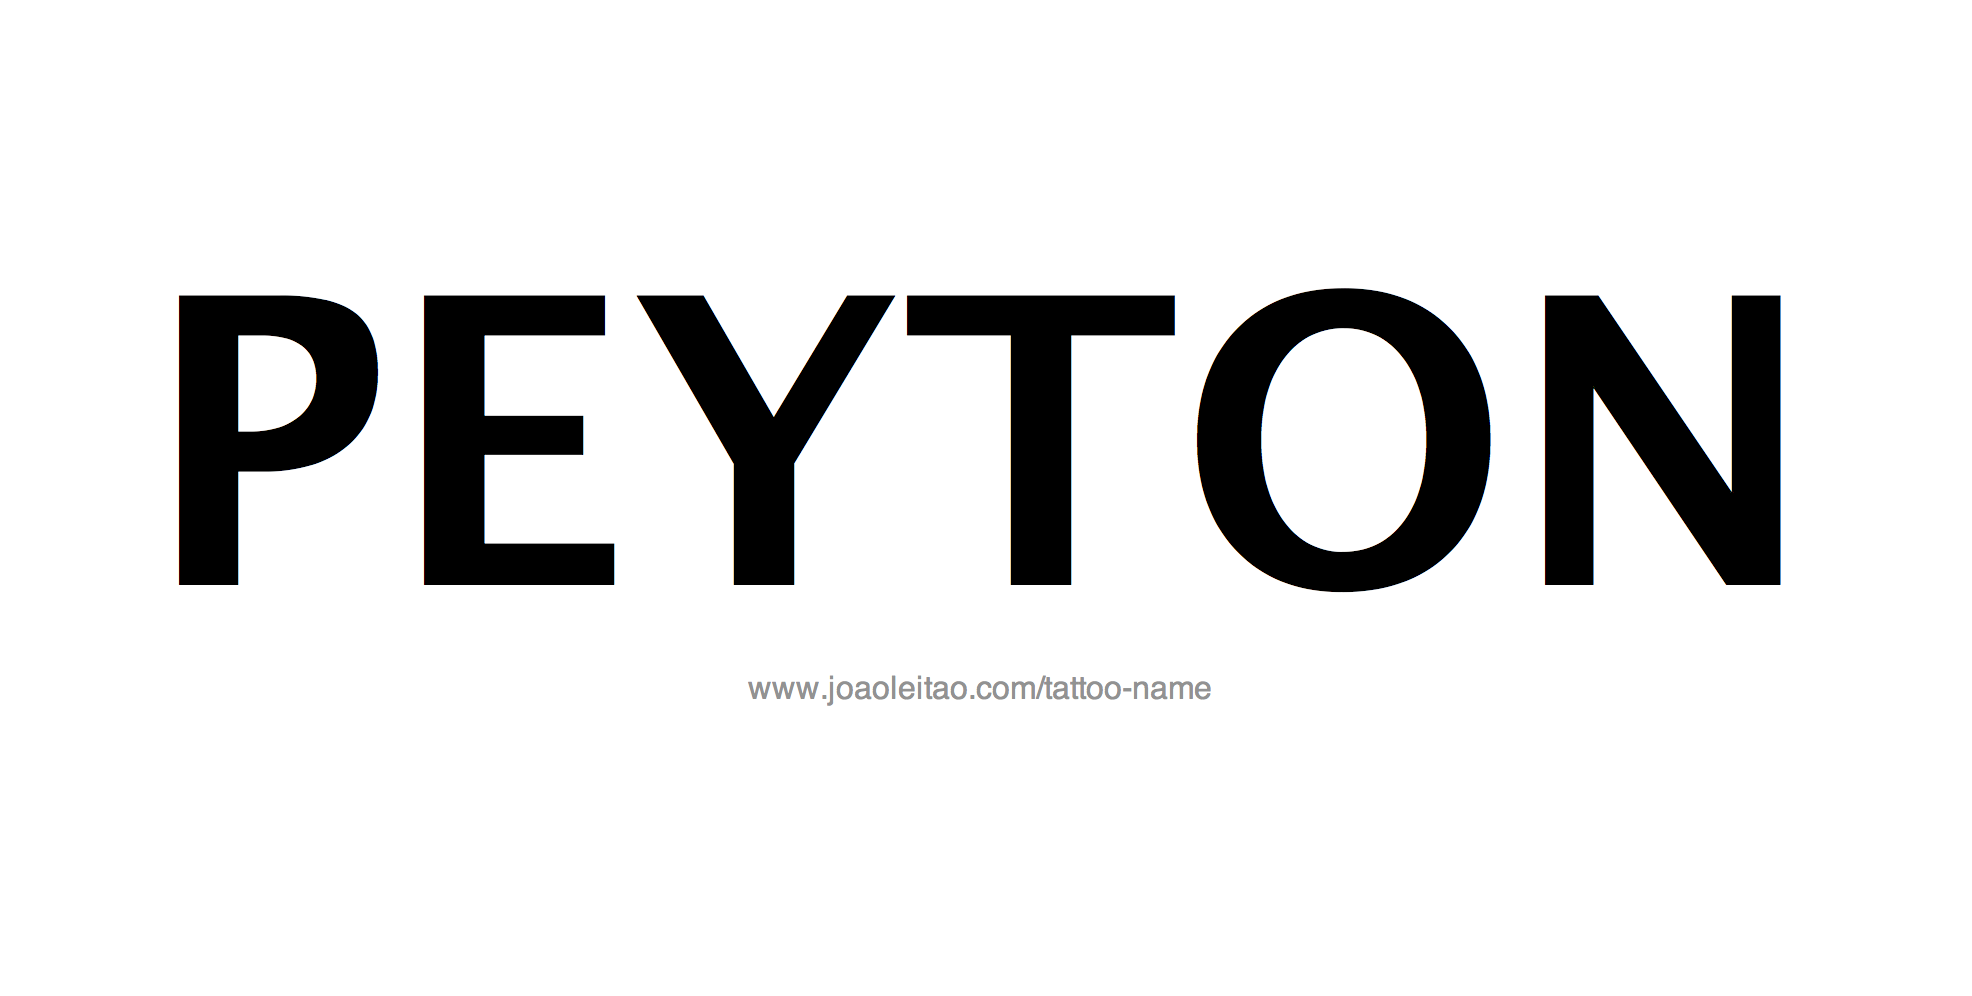 %name%: Peyton Name Tattoo Designs